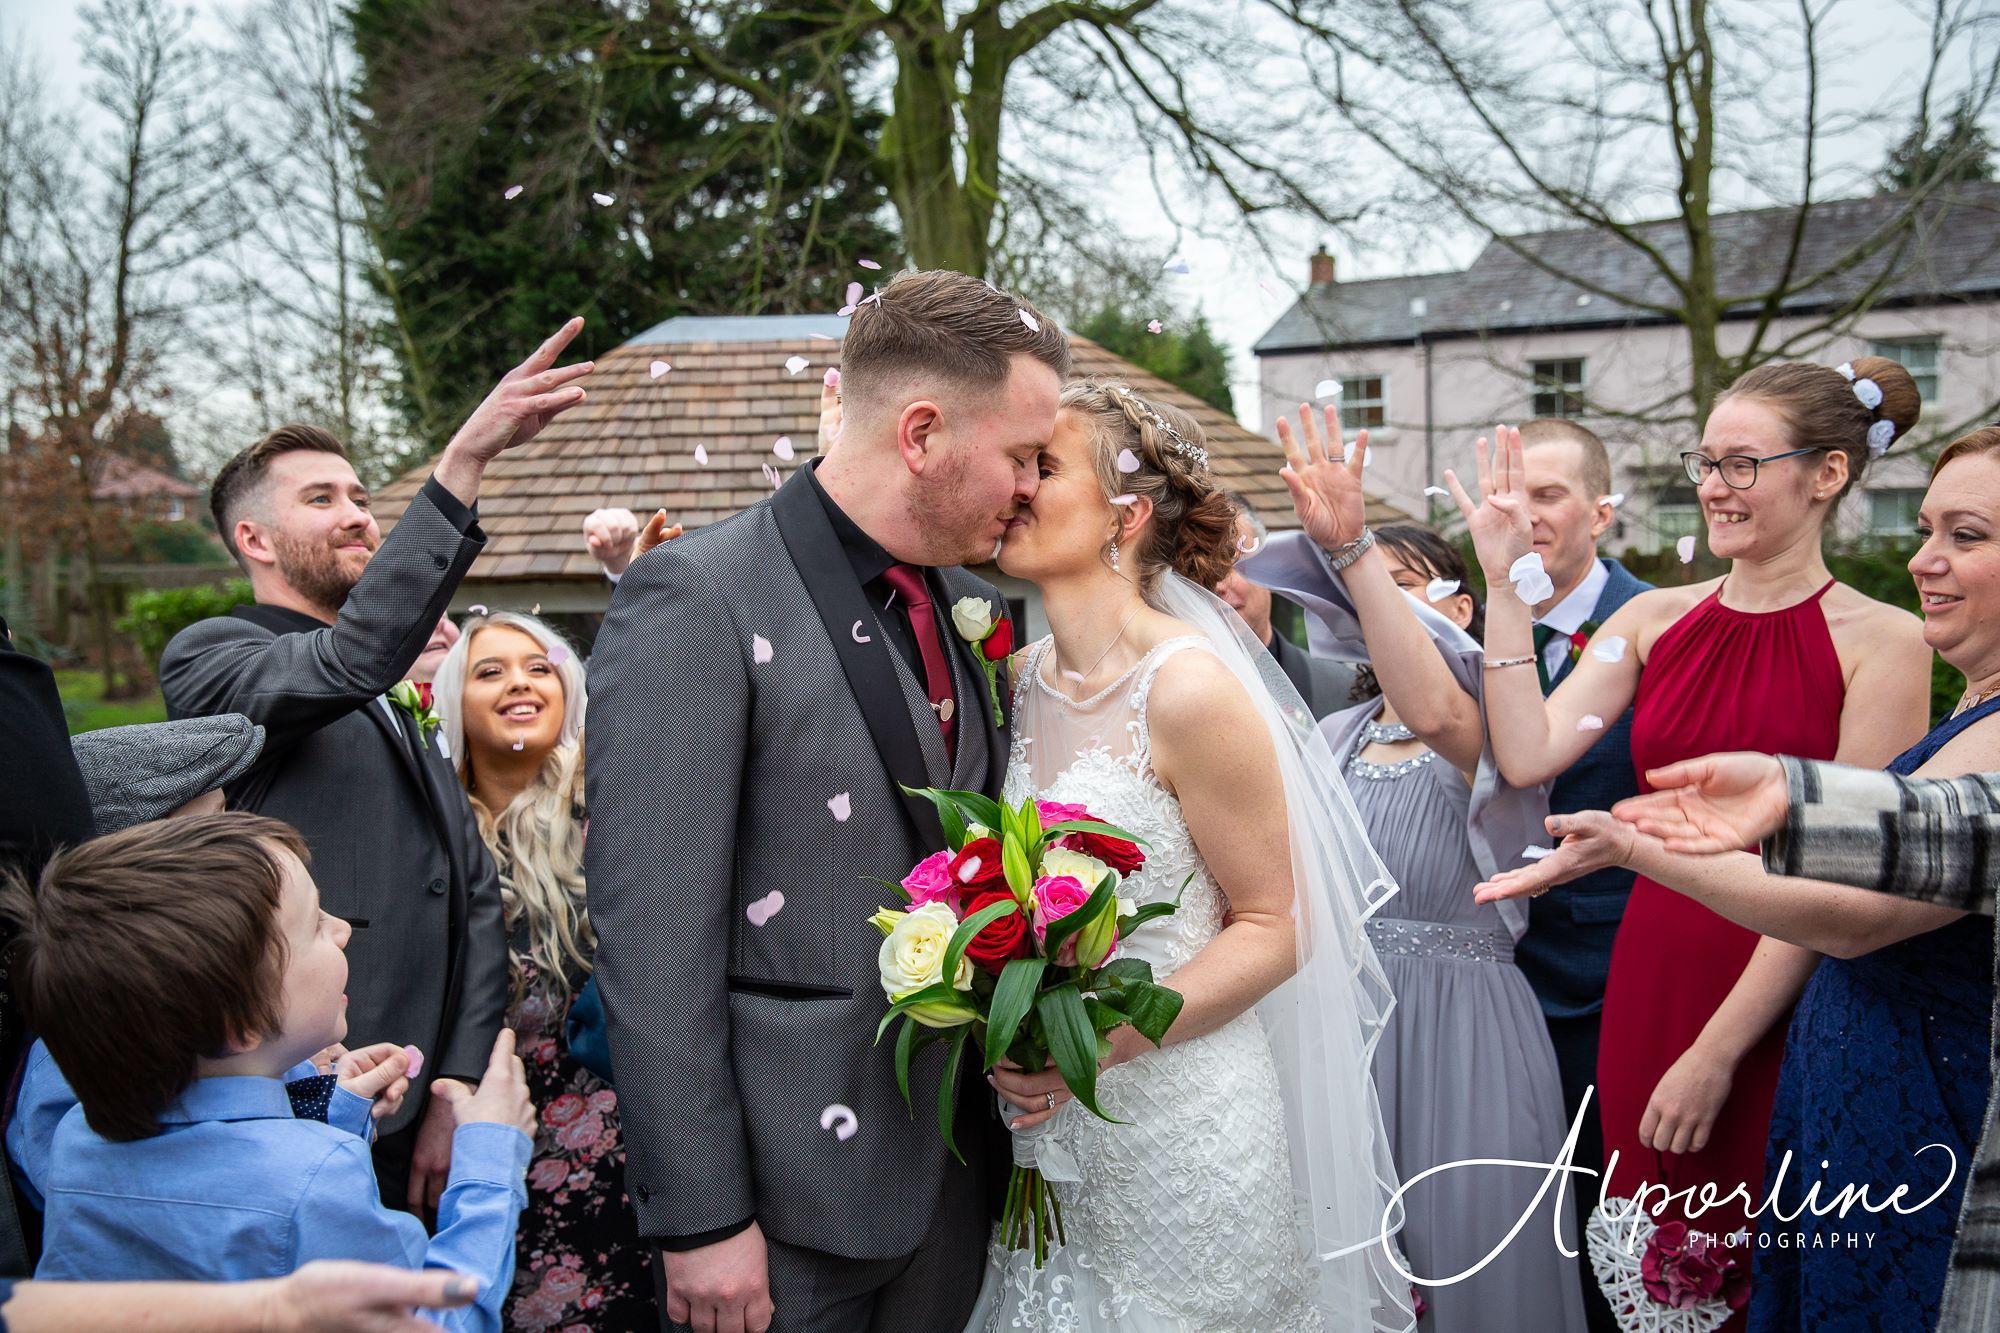 Ribby-Hall-hotel-wedding-photograph-preston-wedding-photographer.jpg